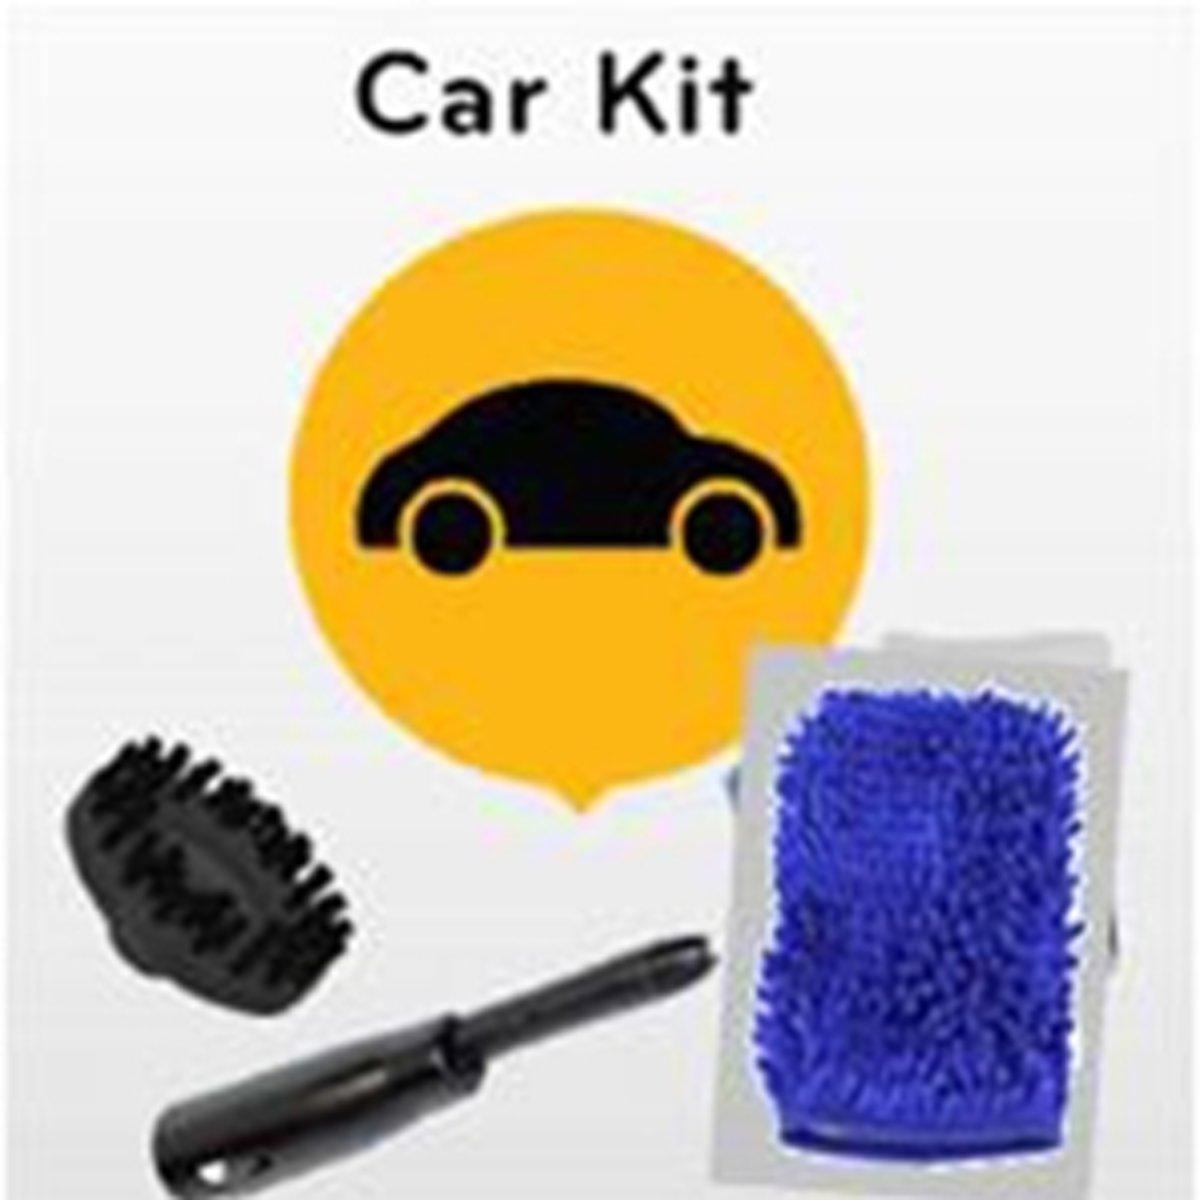 H2o Mop X5 - Upsell - Car Lovers Kit